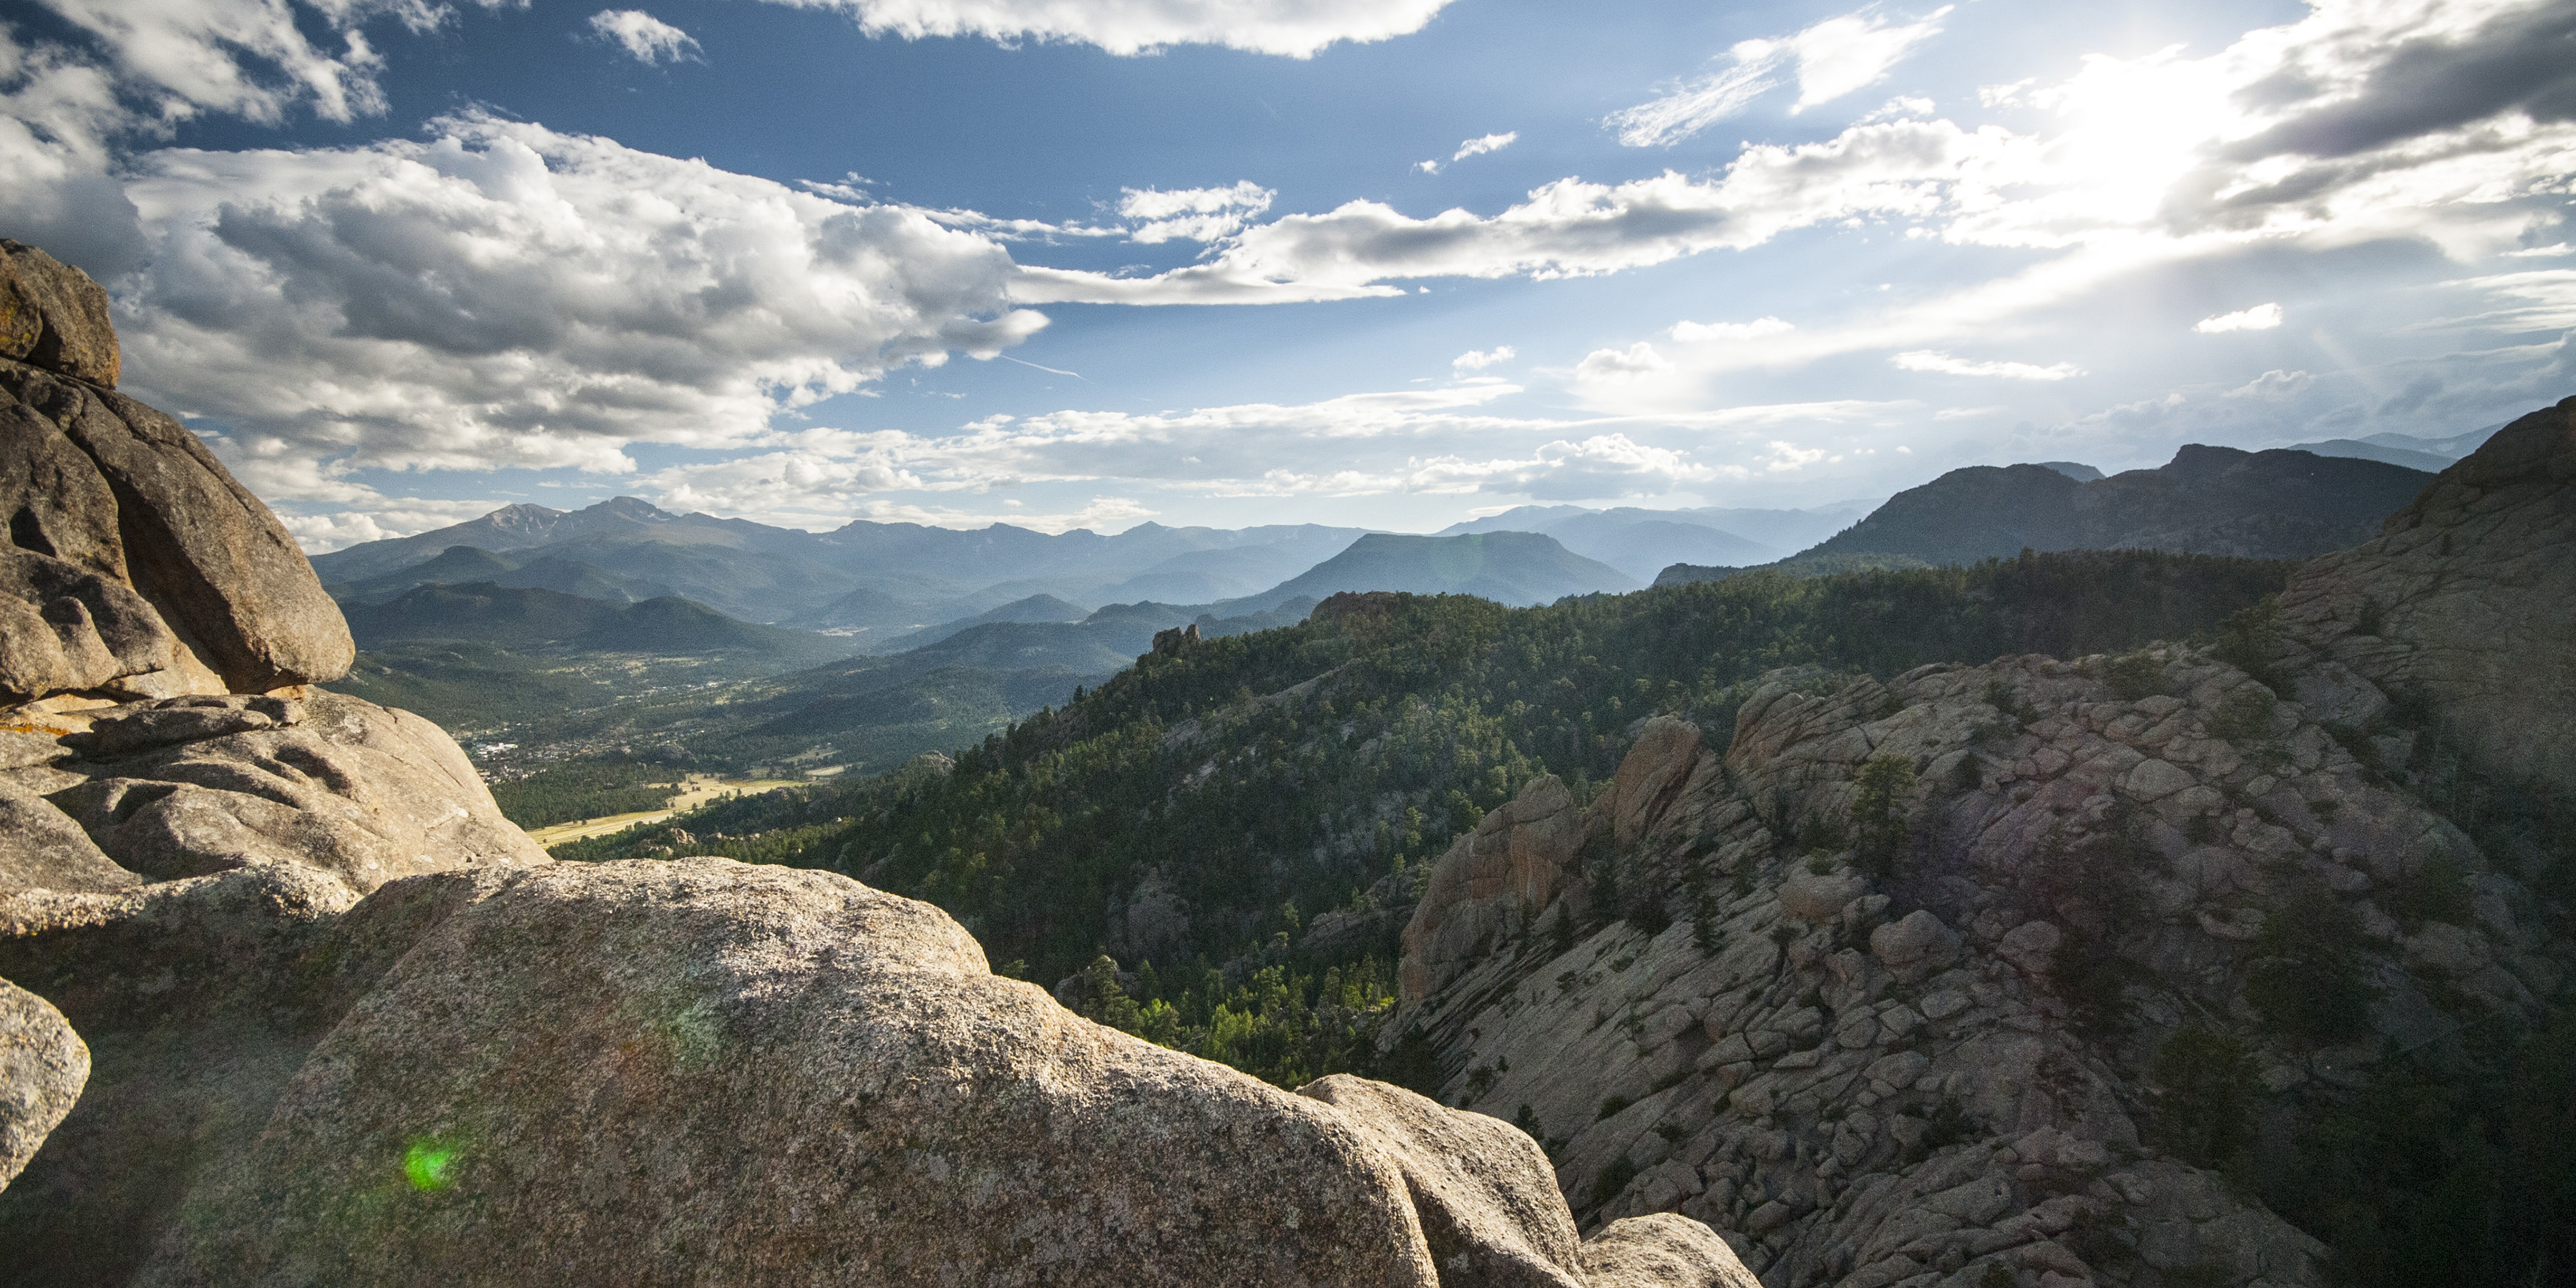 Park 6 Rocky Mountain National Park